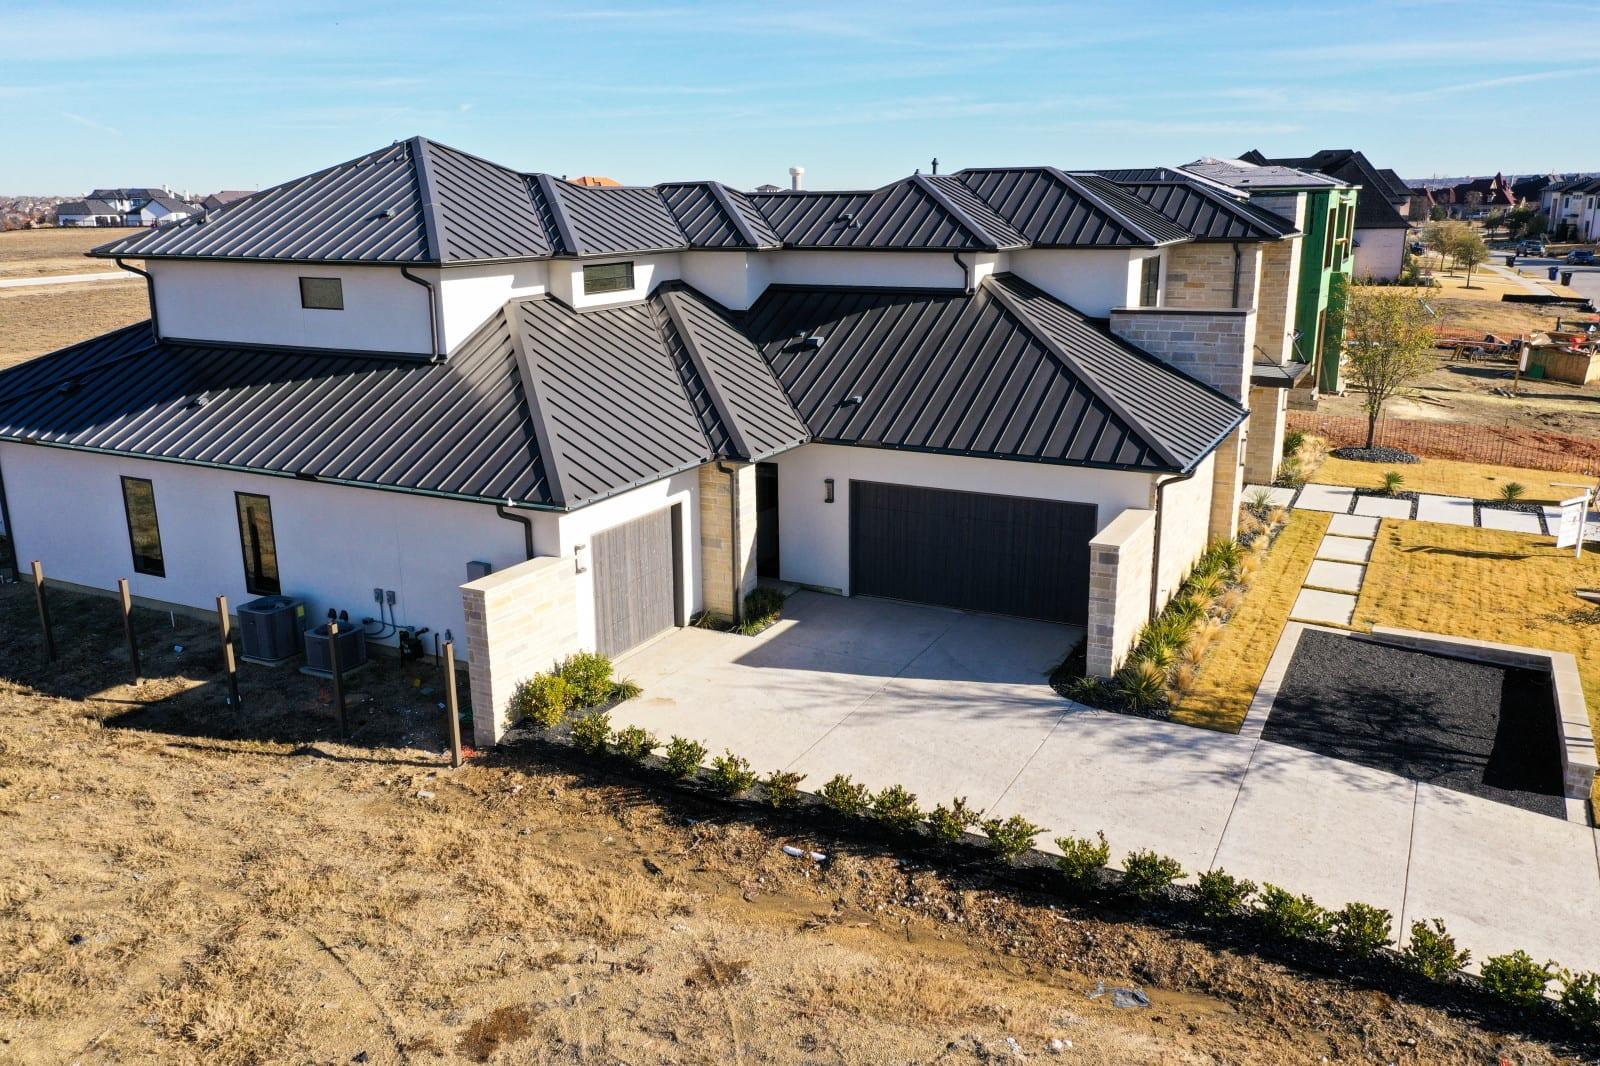 Modern Style Homes design # 3 - Millennial Design + Build